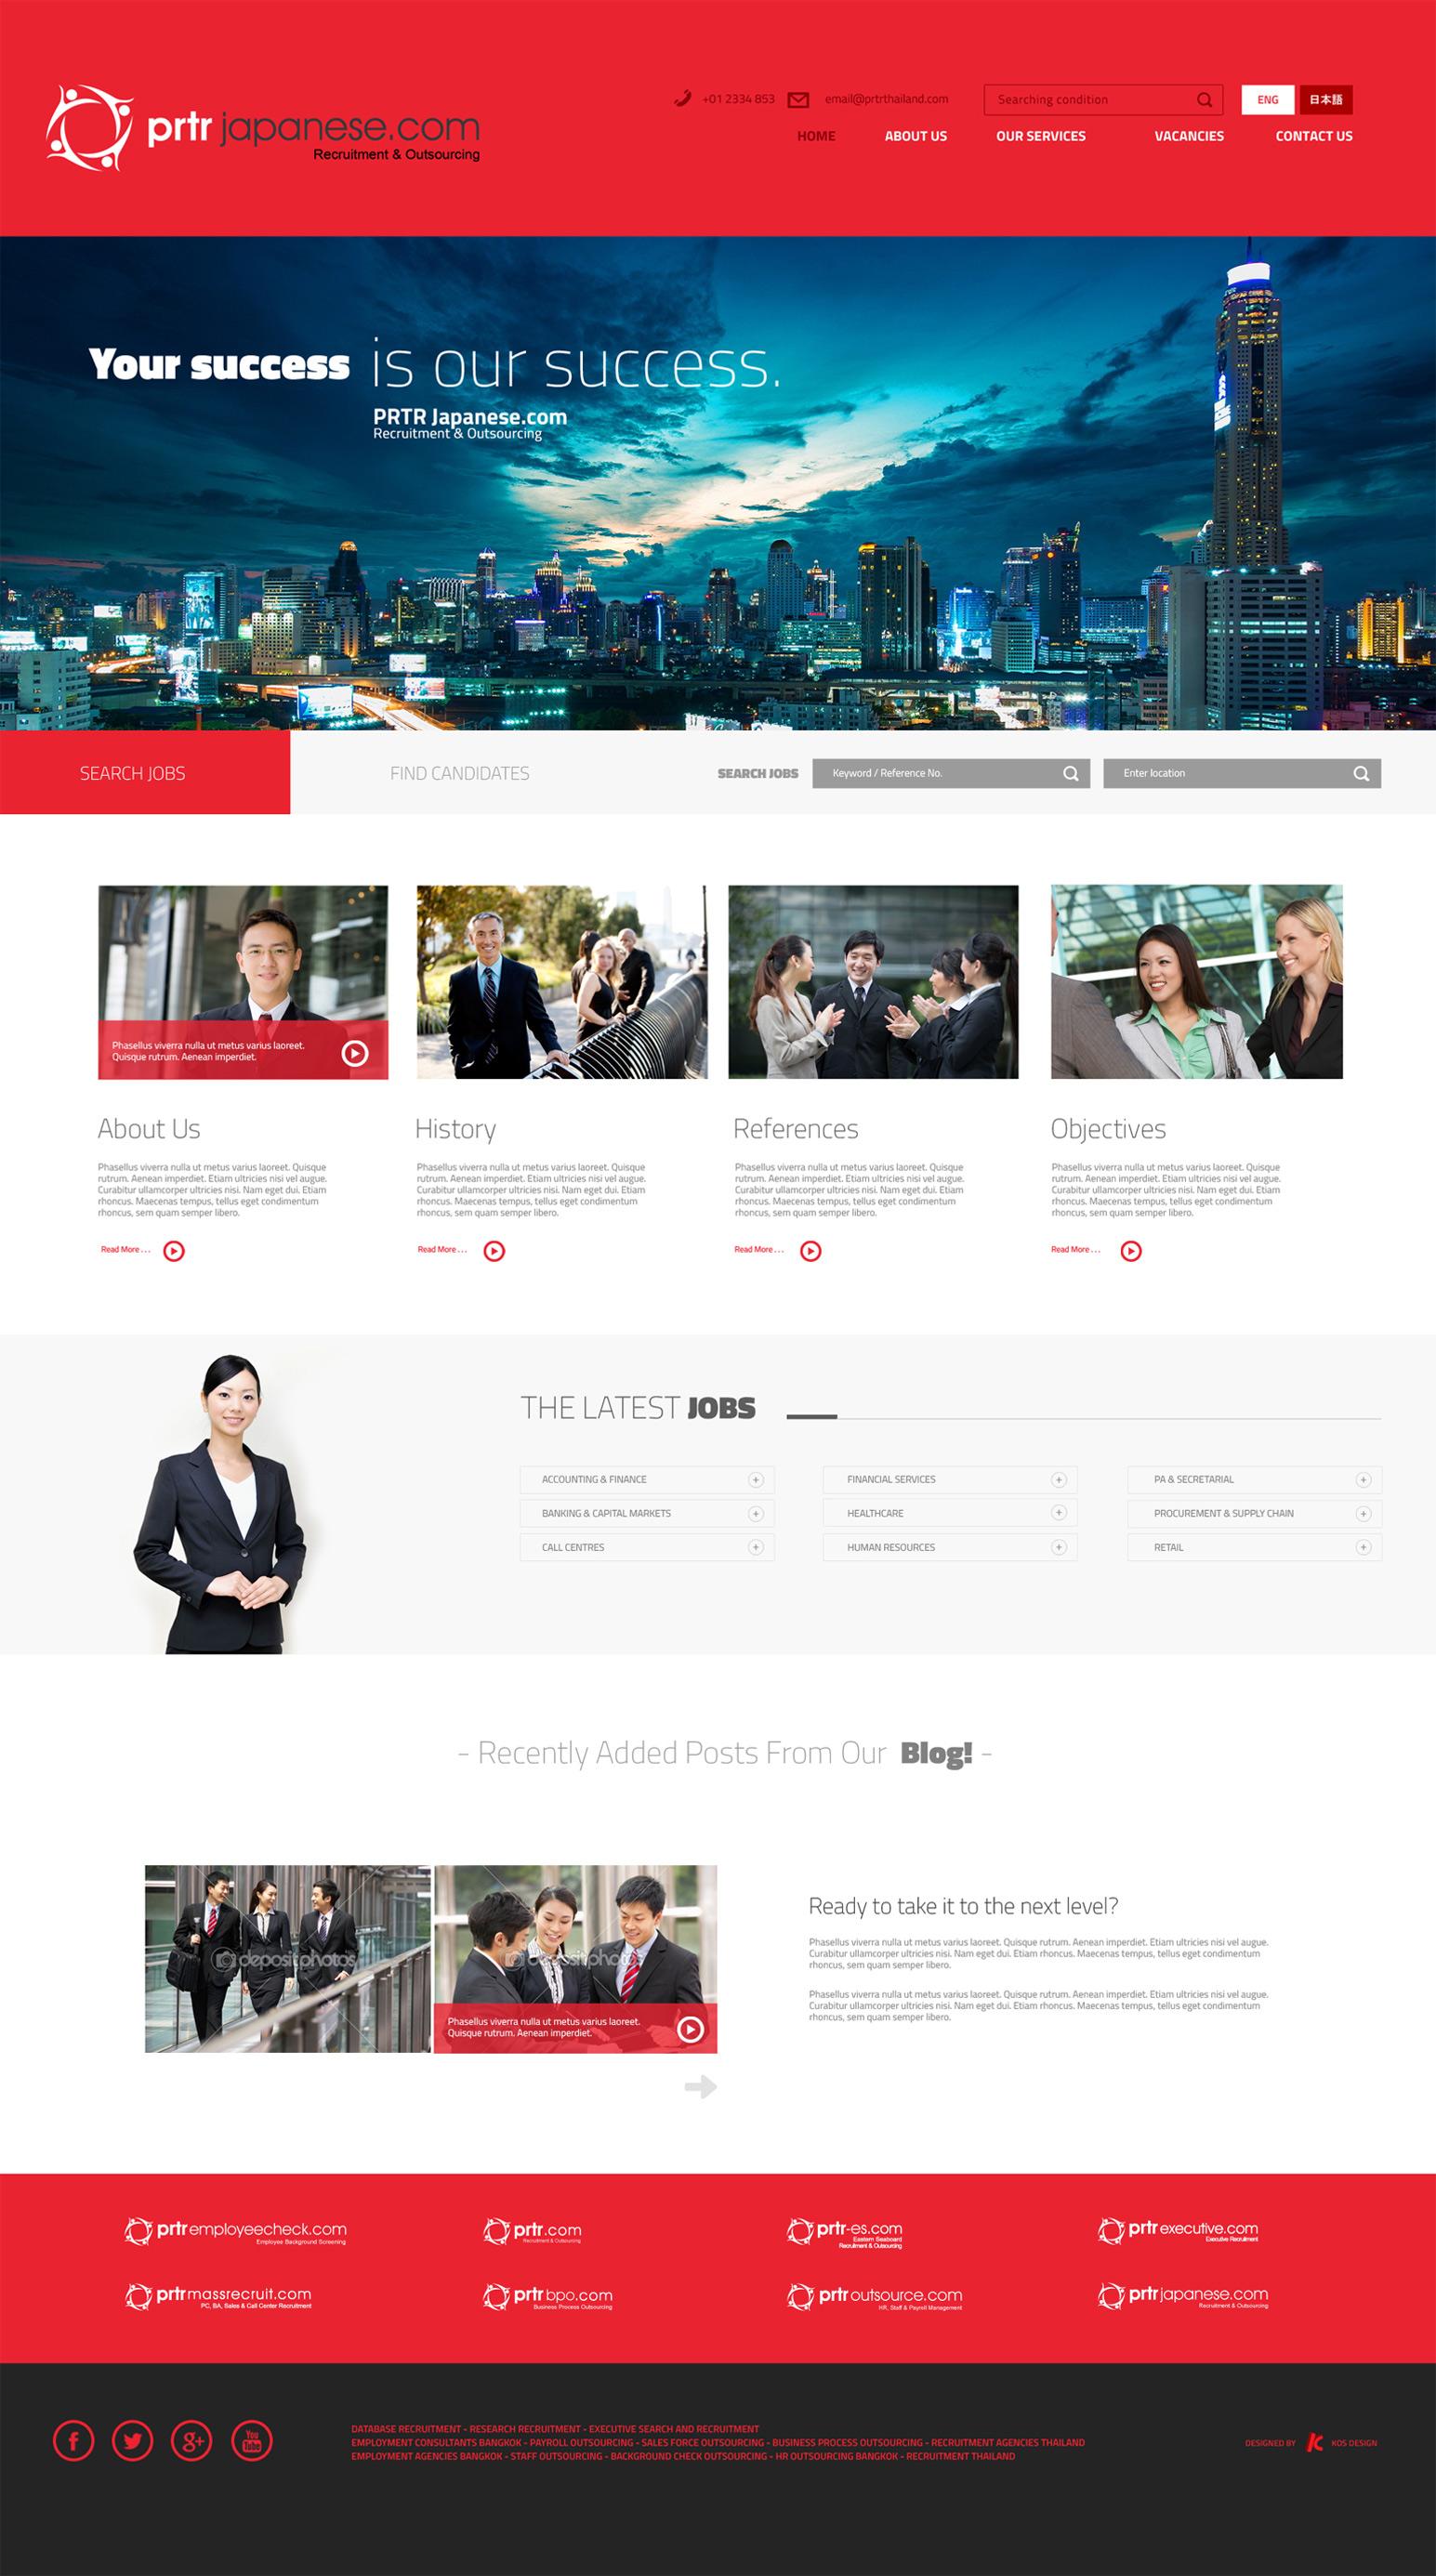 KOS Design - PRTR Japanese